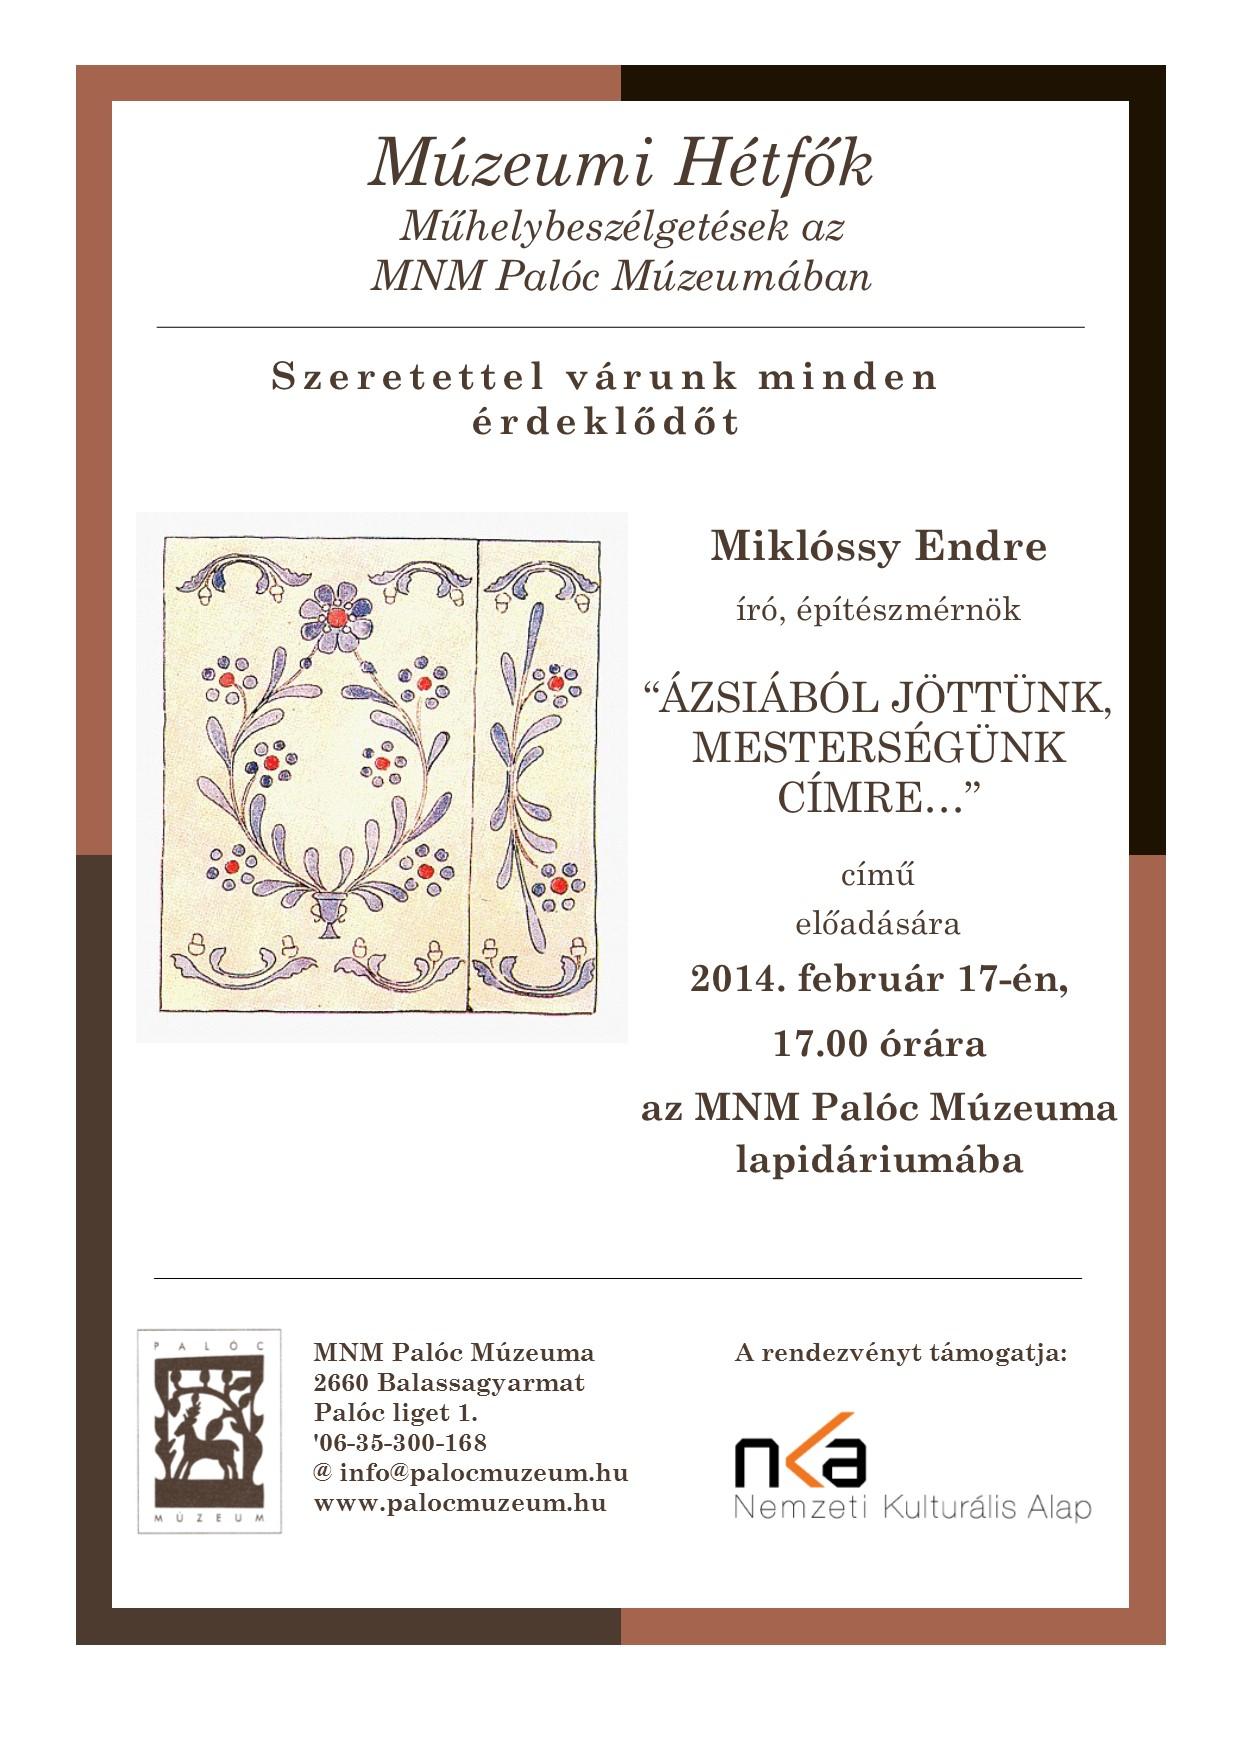 plakat_muzeumi_hetf_140217